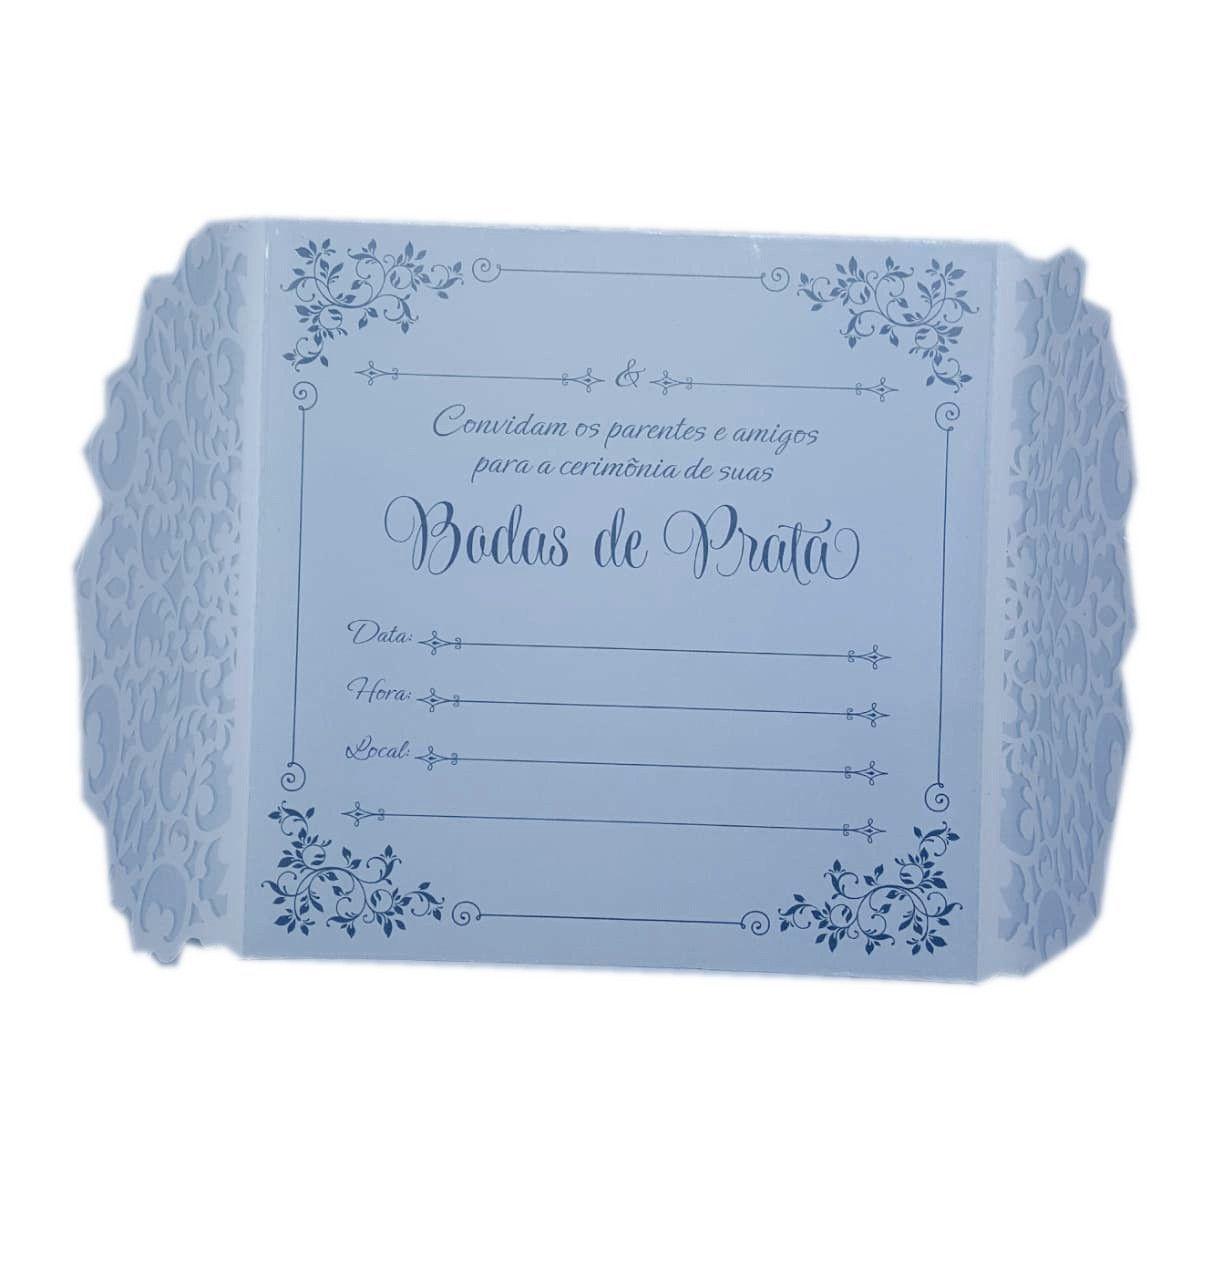 Convite Bodas De Prata Premium c/08 unidades